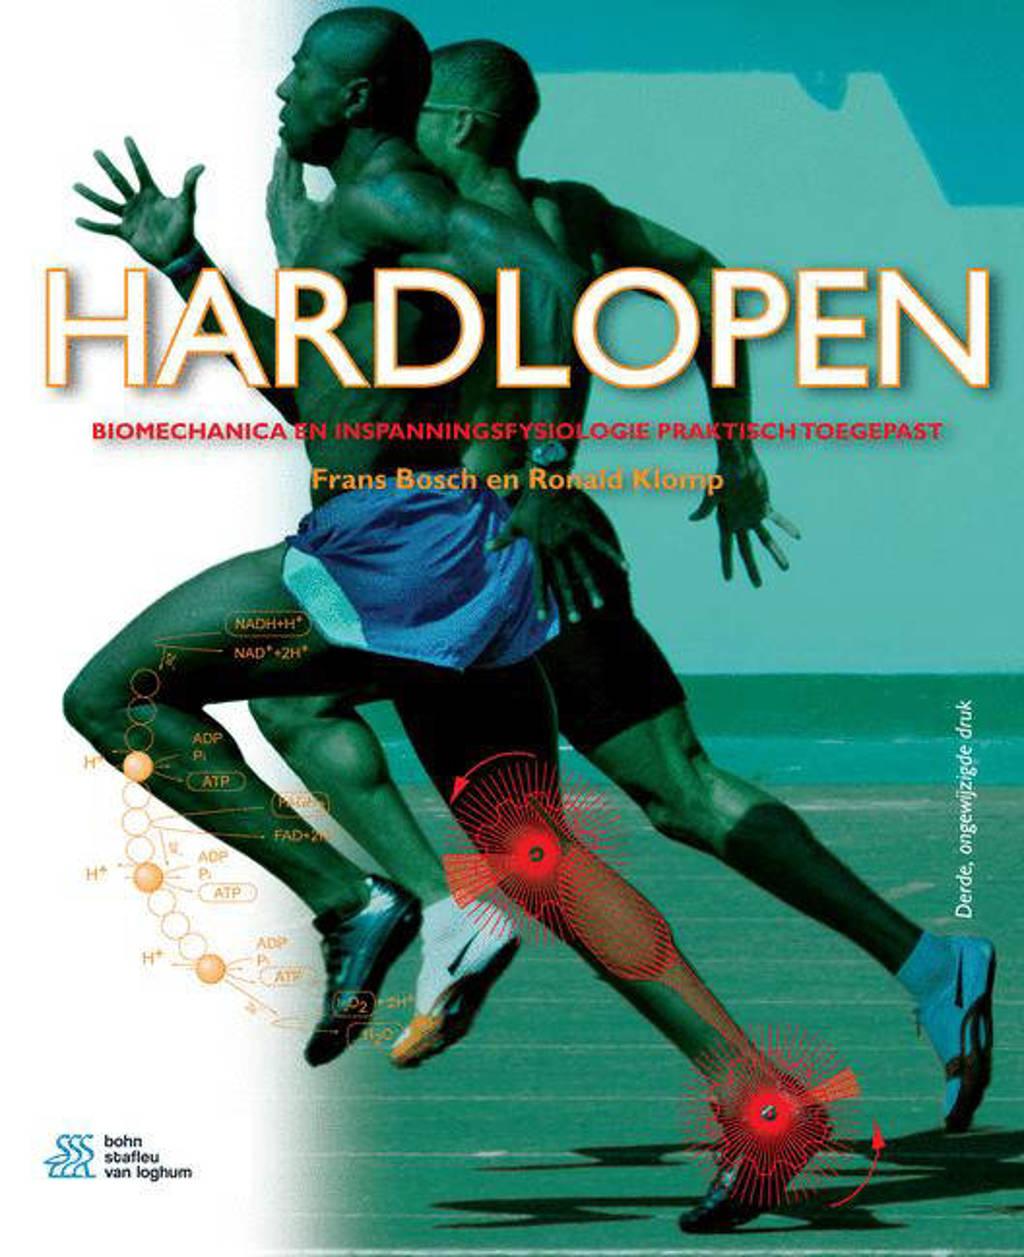 Hardlopen - Frans Bosch en Ronald Klomp